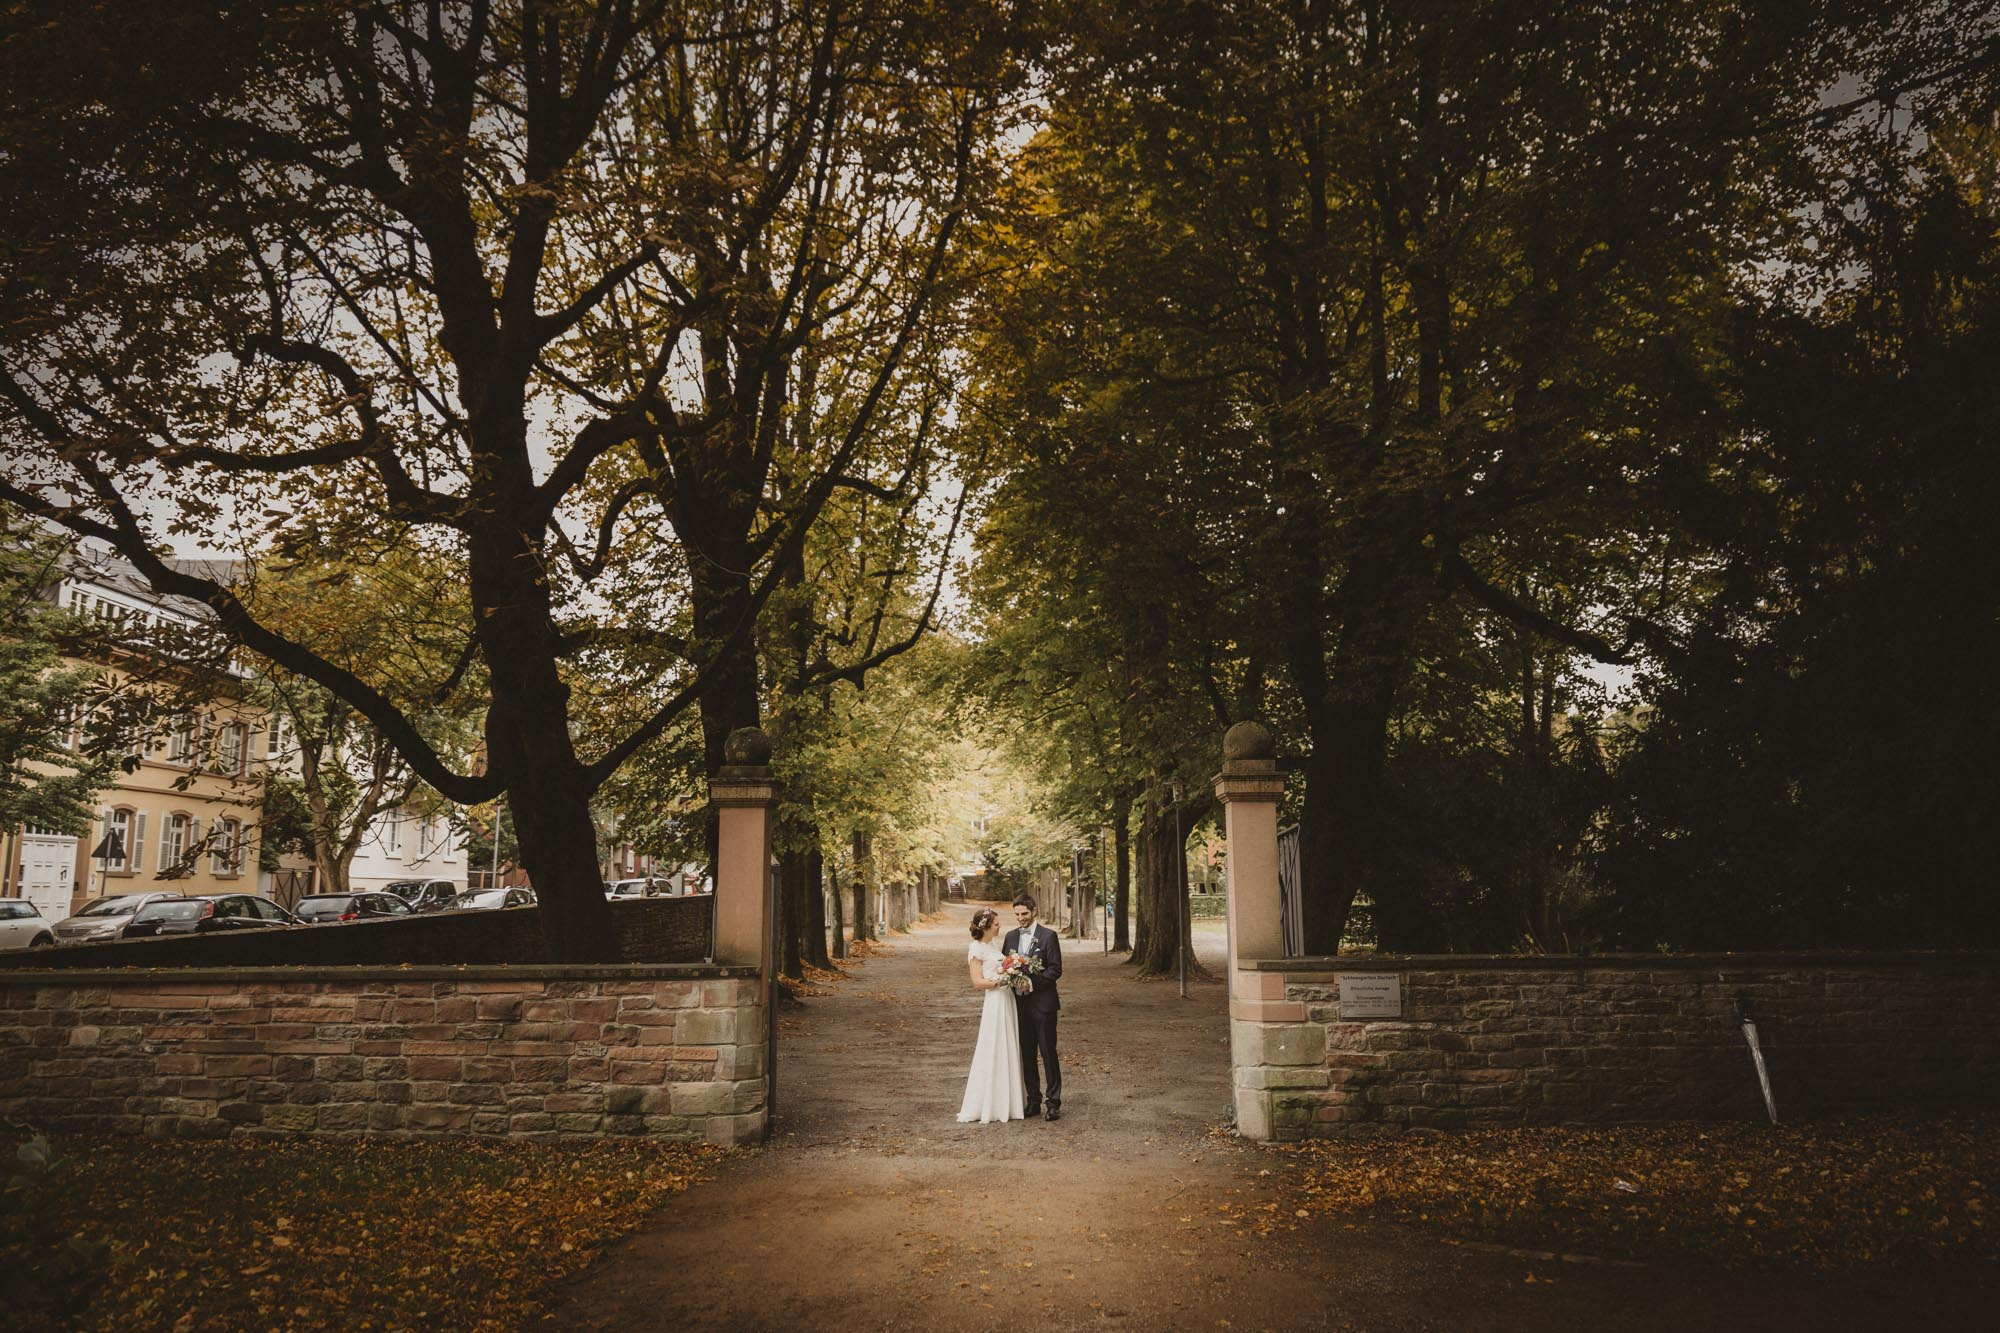 Hochzeitsfotografie-Karlsruhe-Ronja-Flo-32